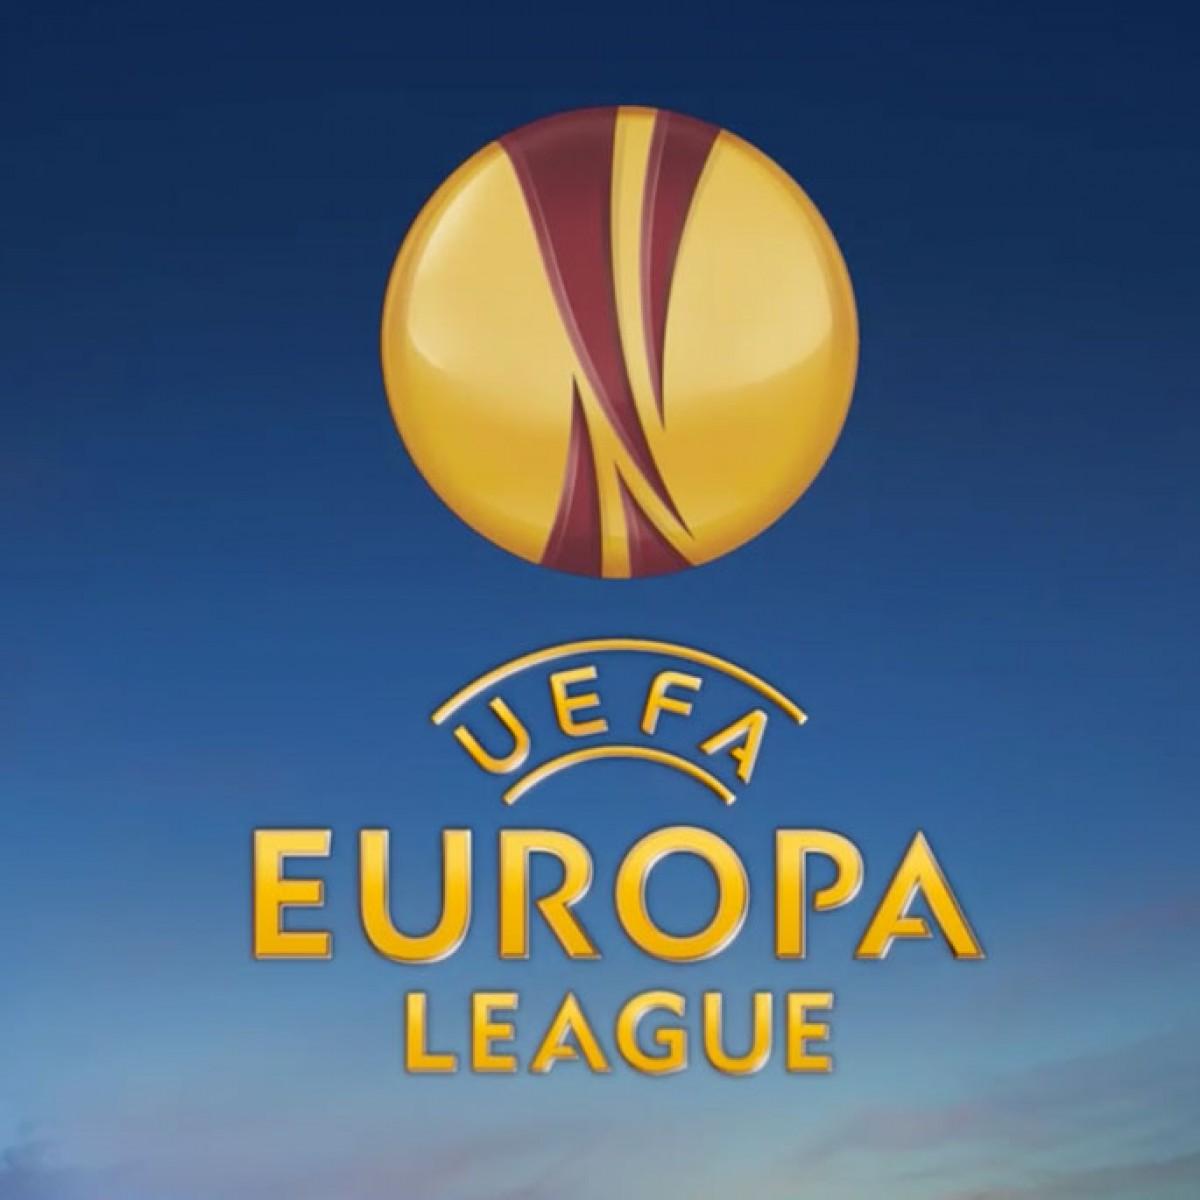 Europa League Im Free Tv 2021